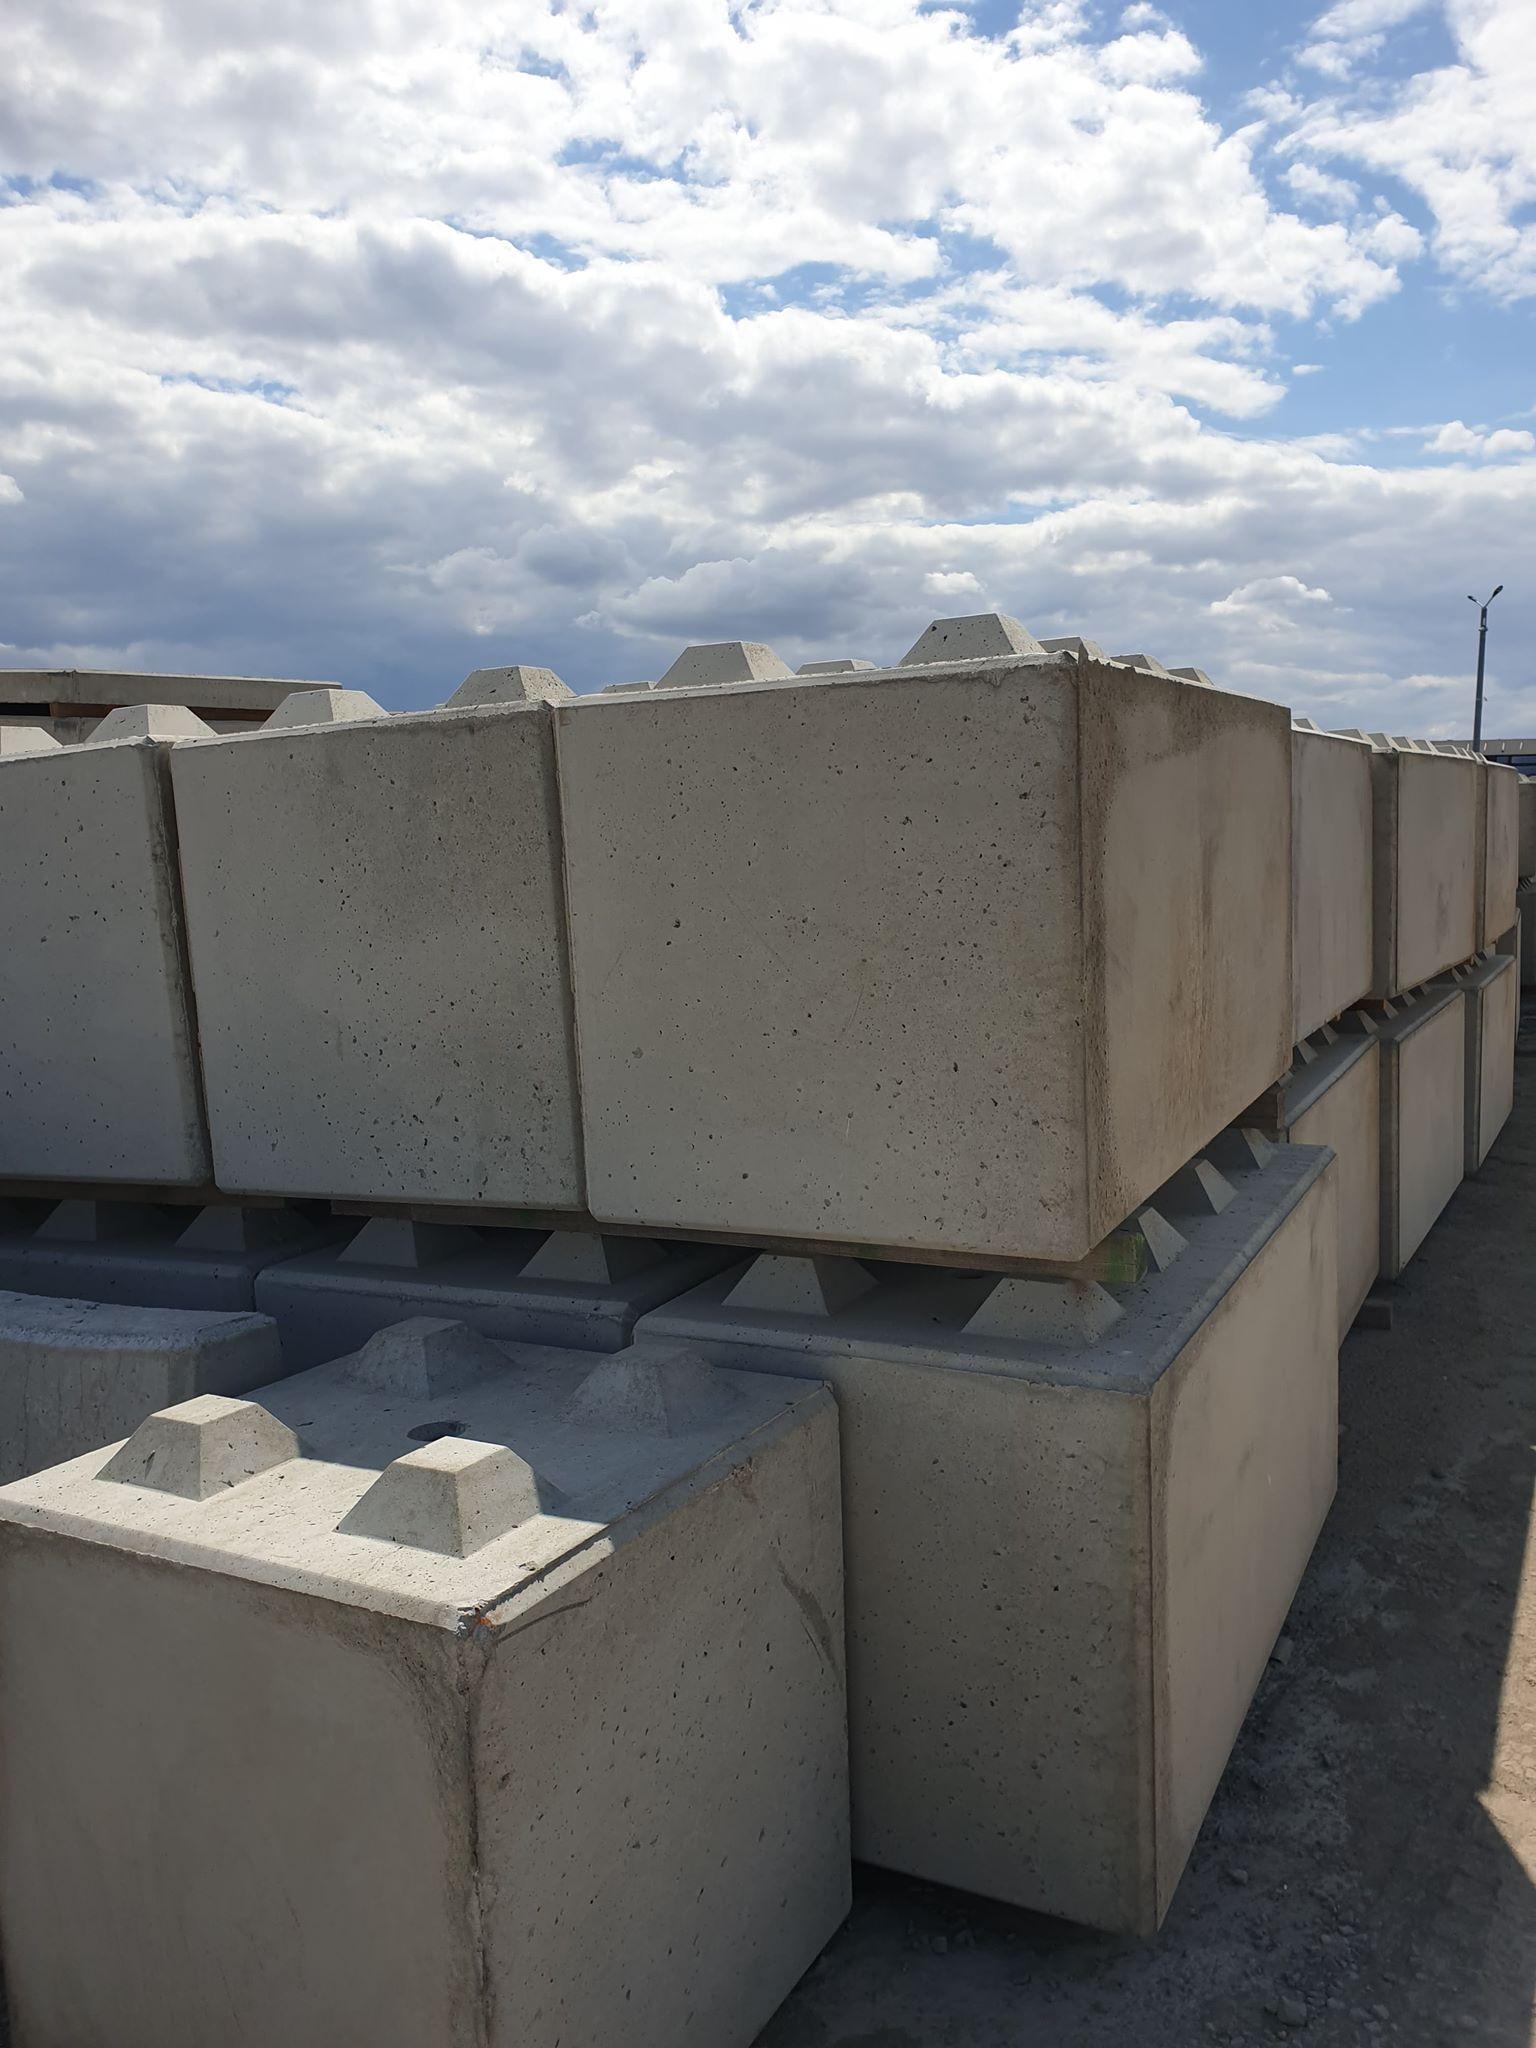 Klocki z betonu na placu